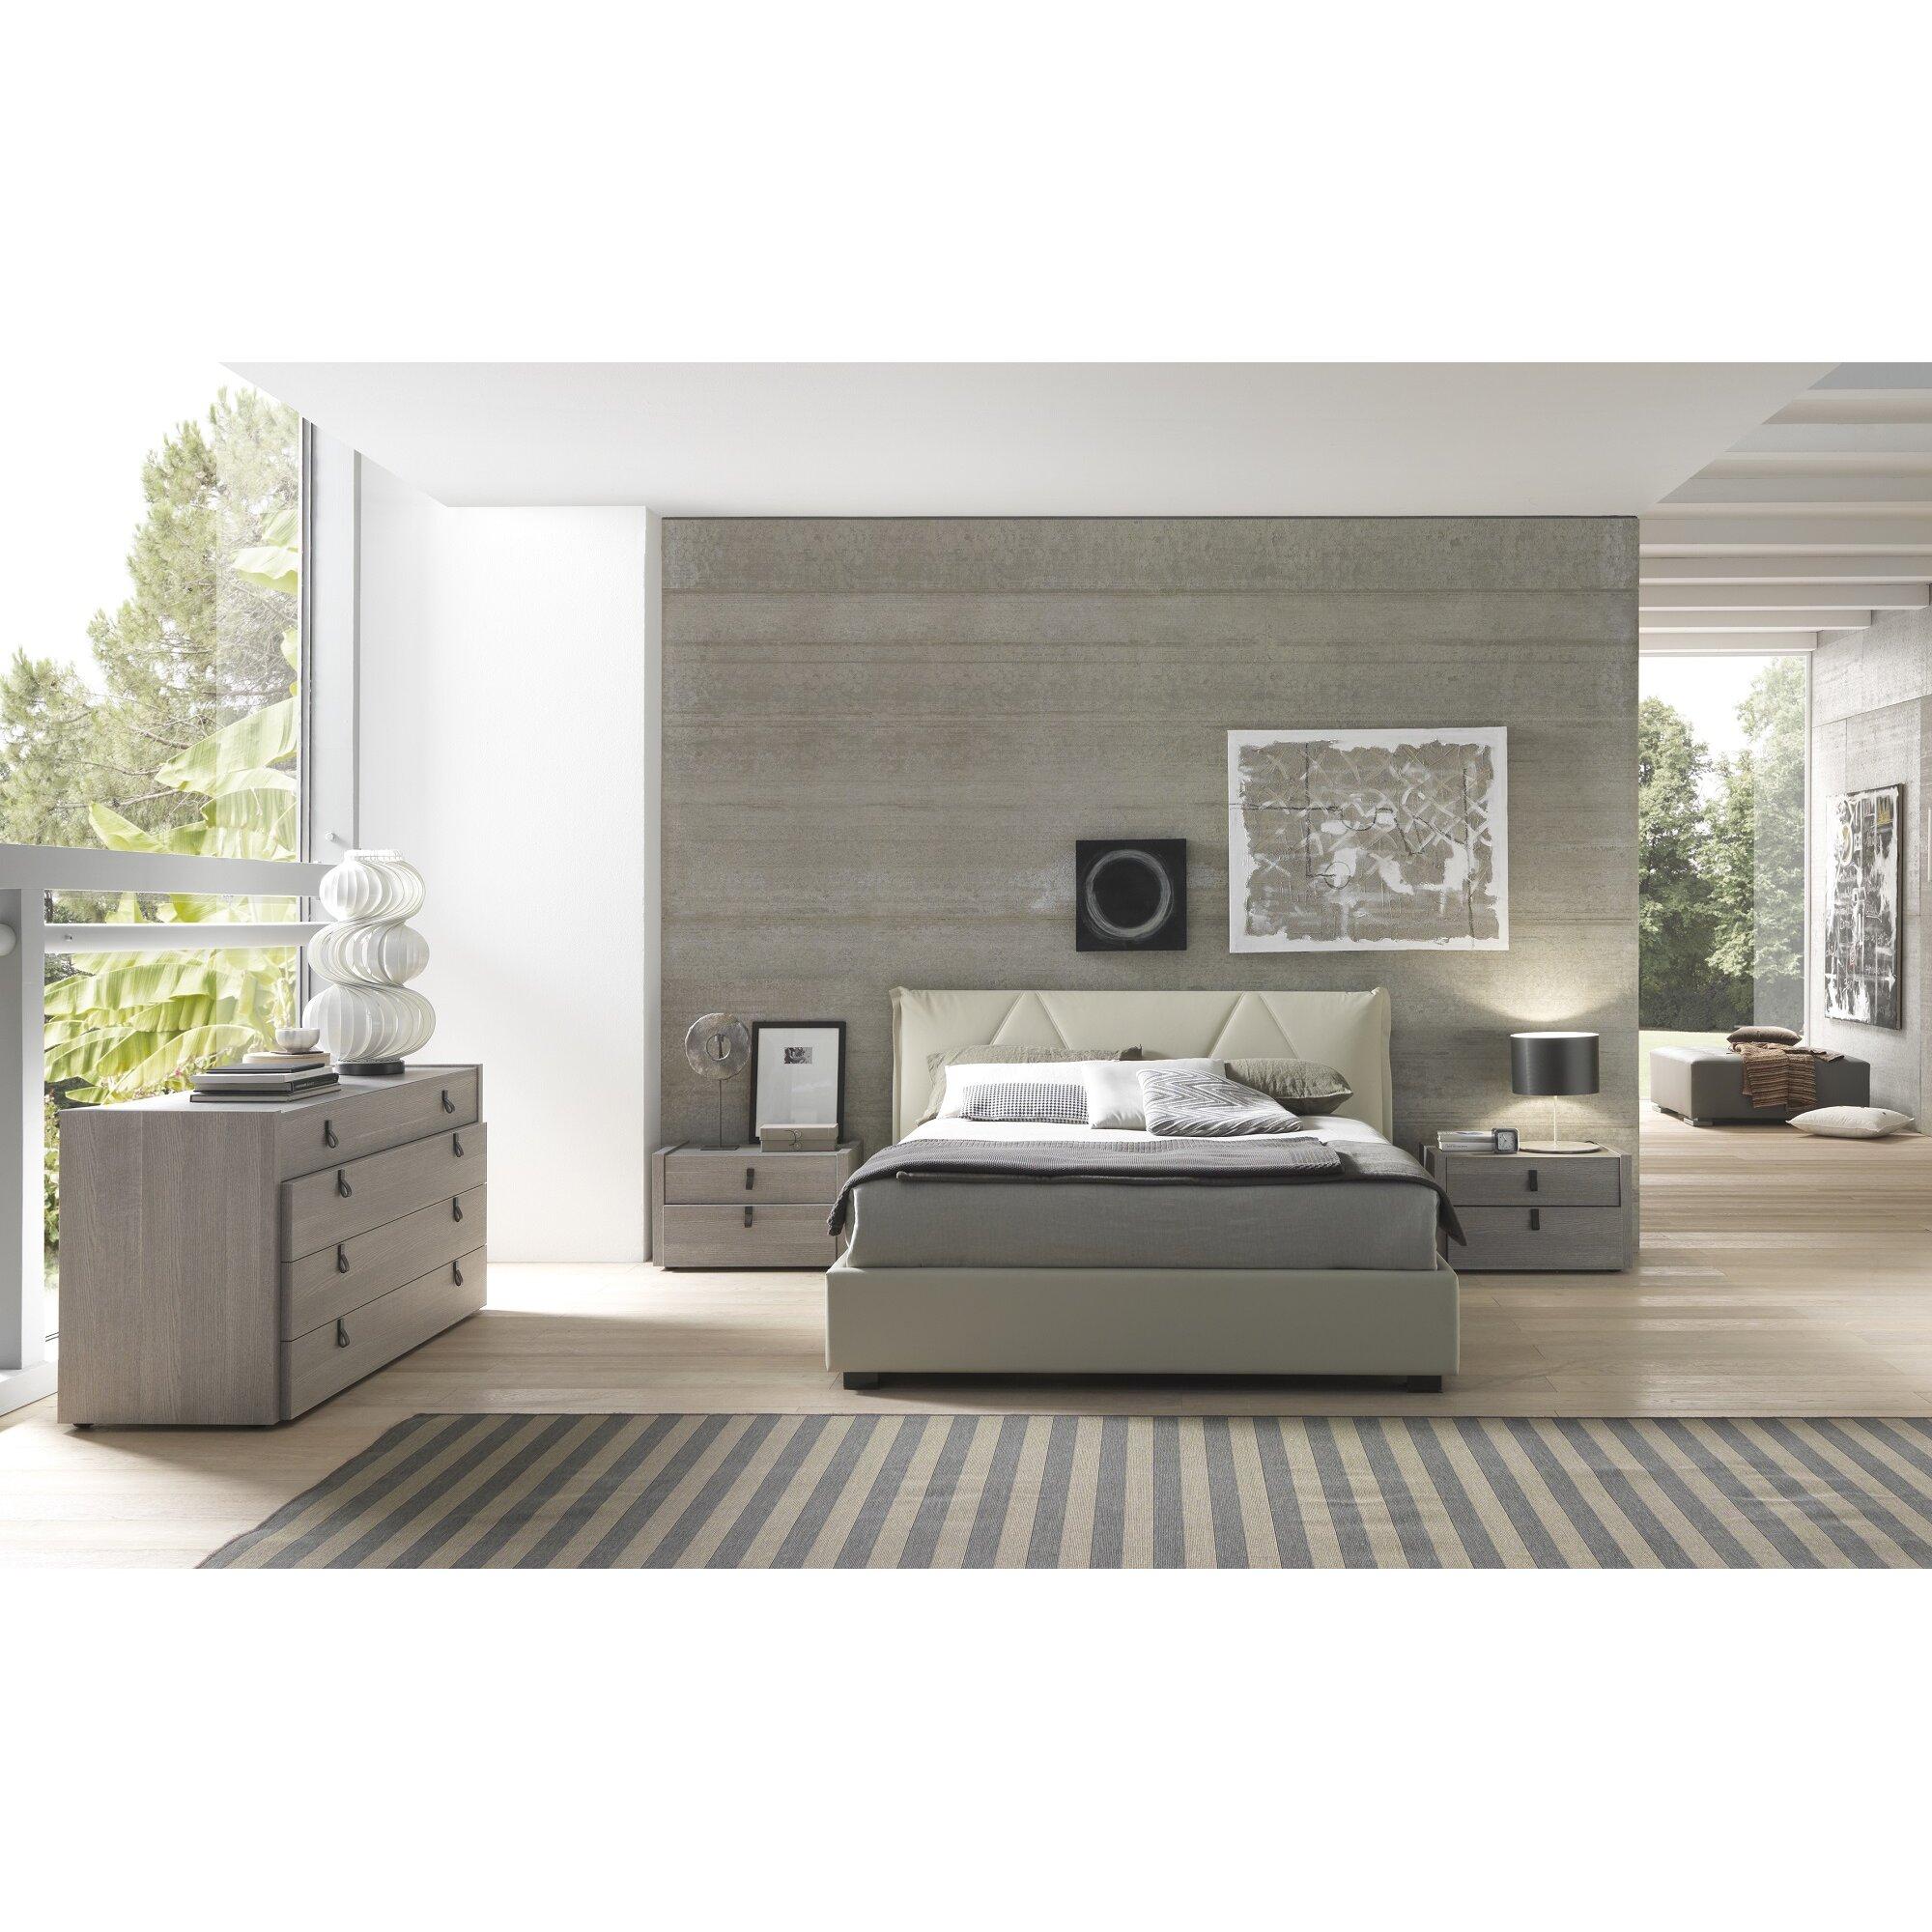 creative furniture esprit queen platform customizable